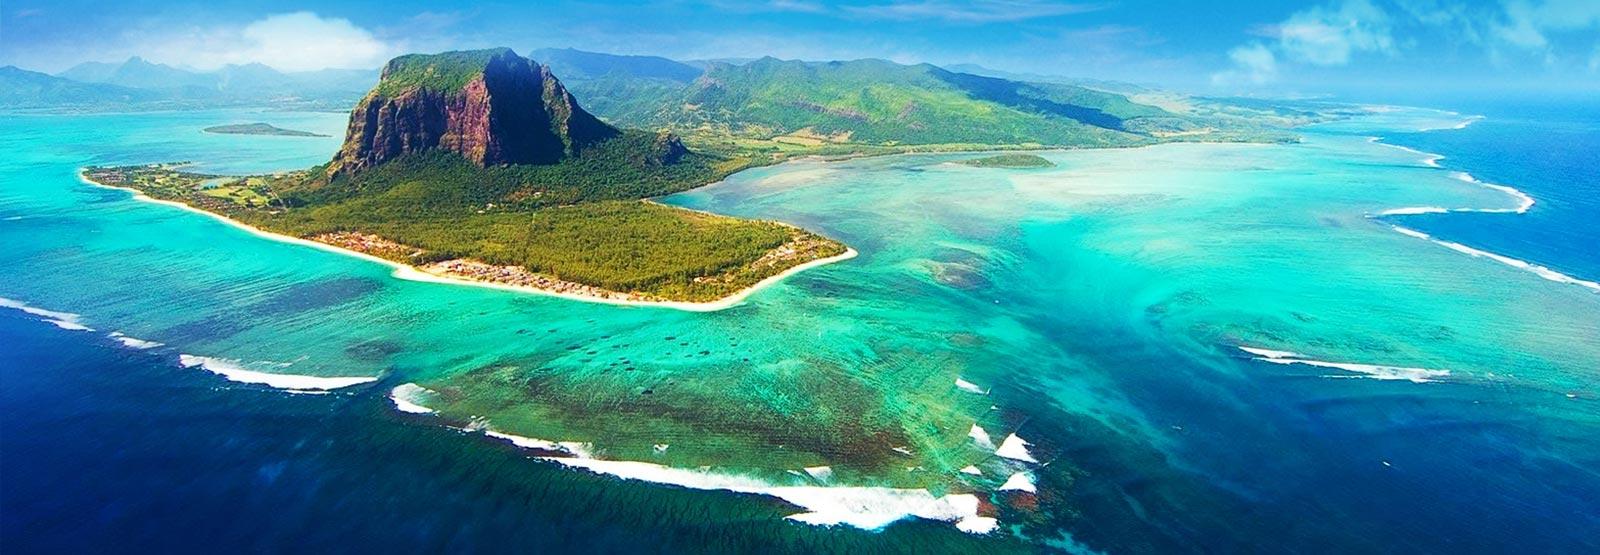 Mauritius Undersea Waterfall